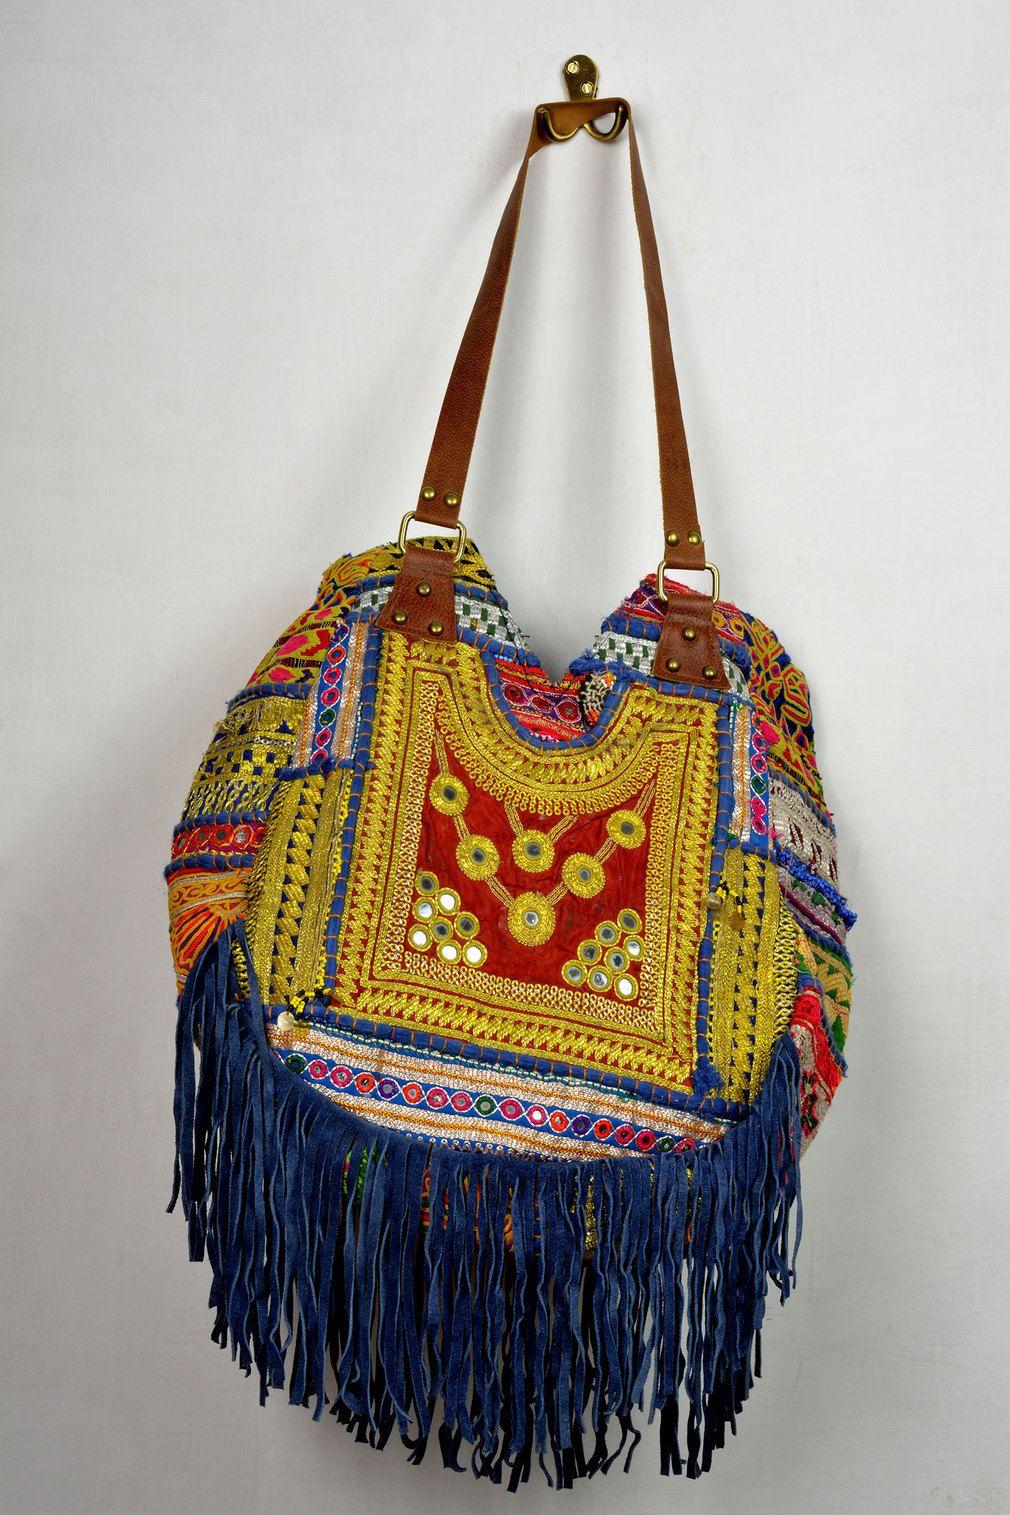 79716873bb76 Hobo Banjara Bag. Hobo Banjara Bag Ethnic